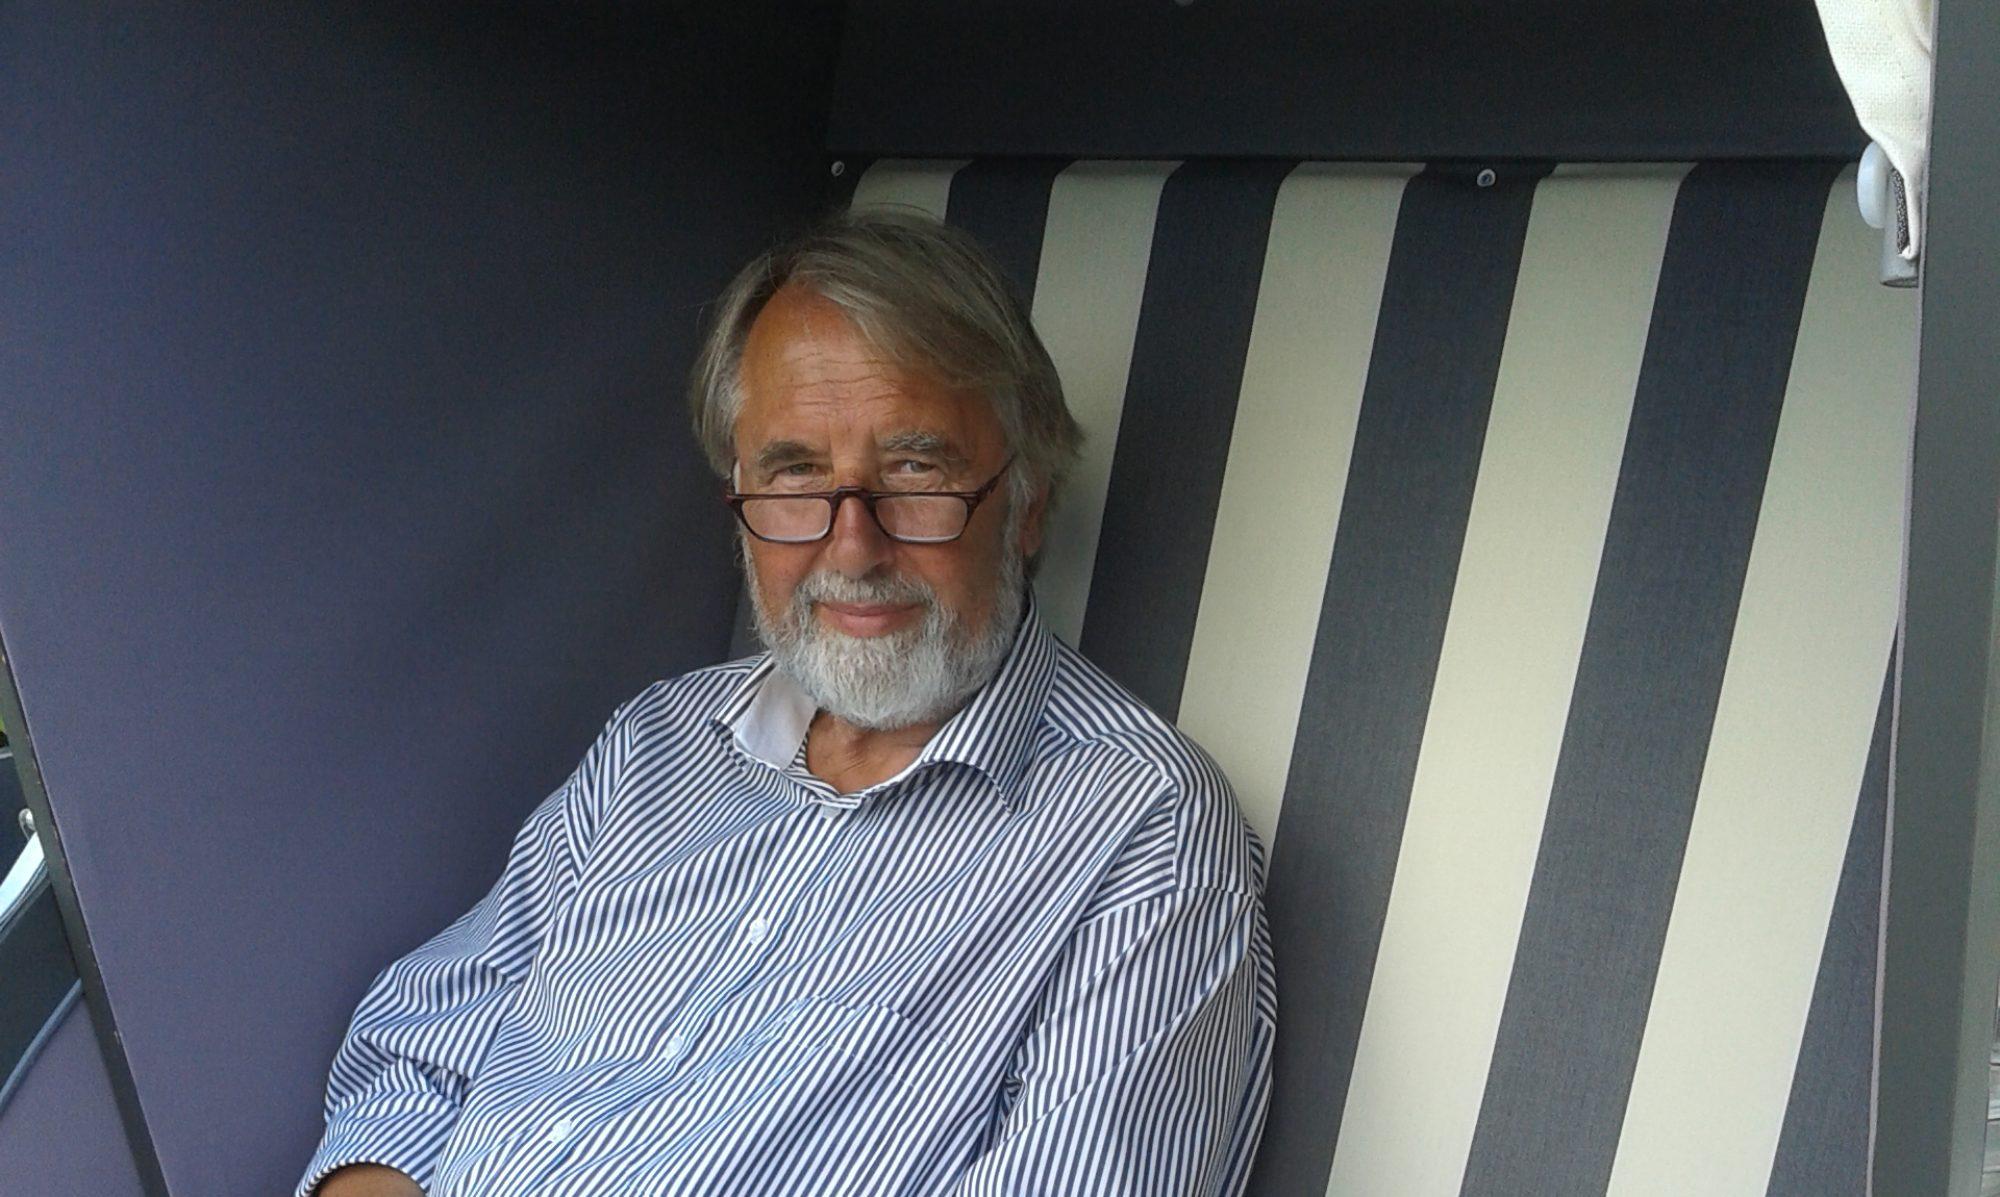 Karl Theodor Schuon